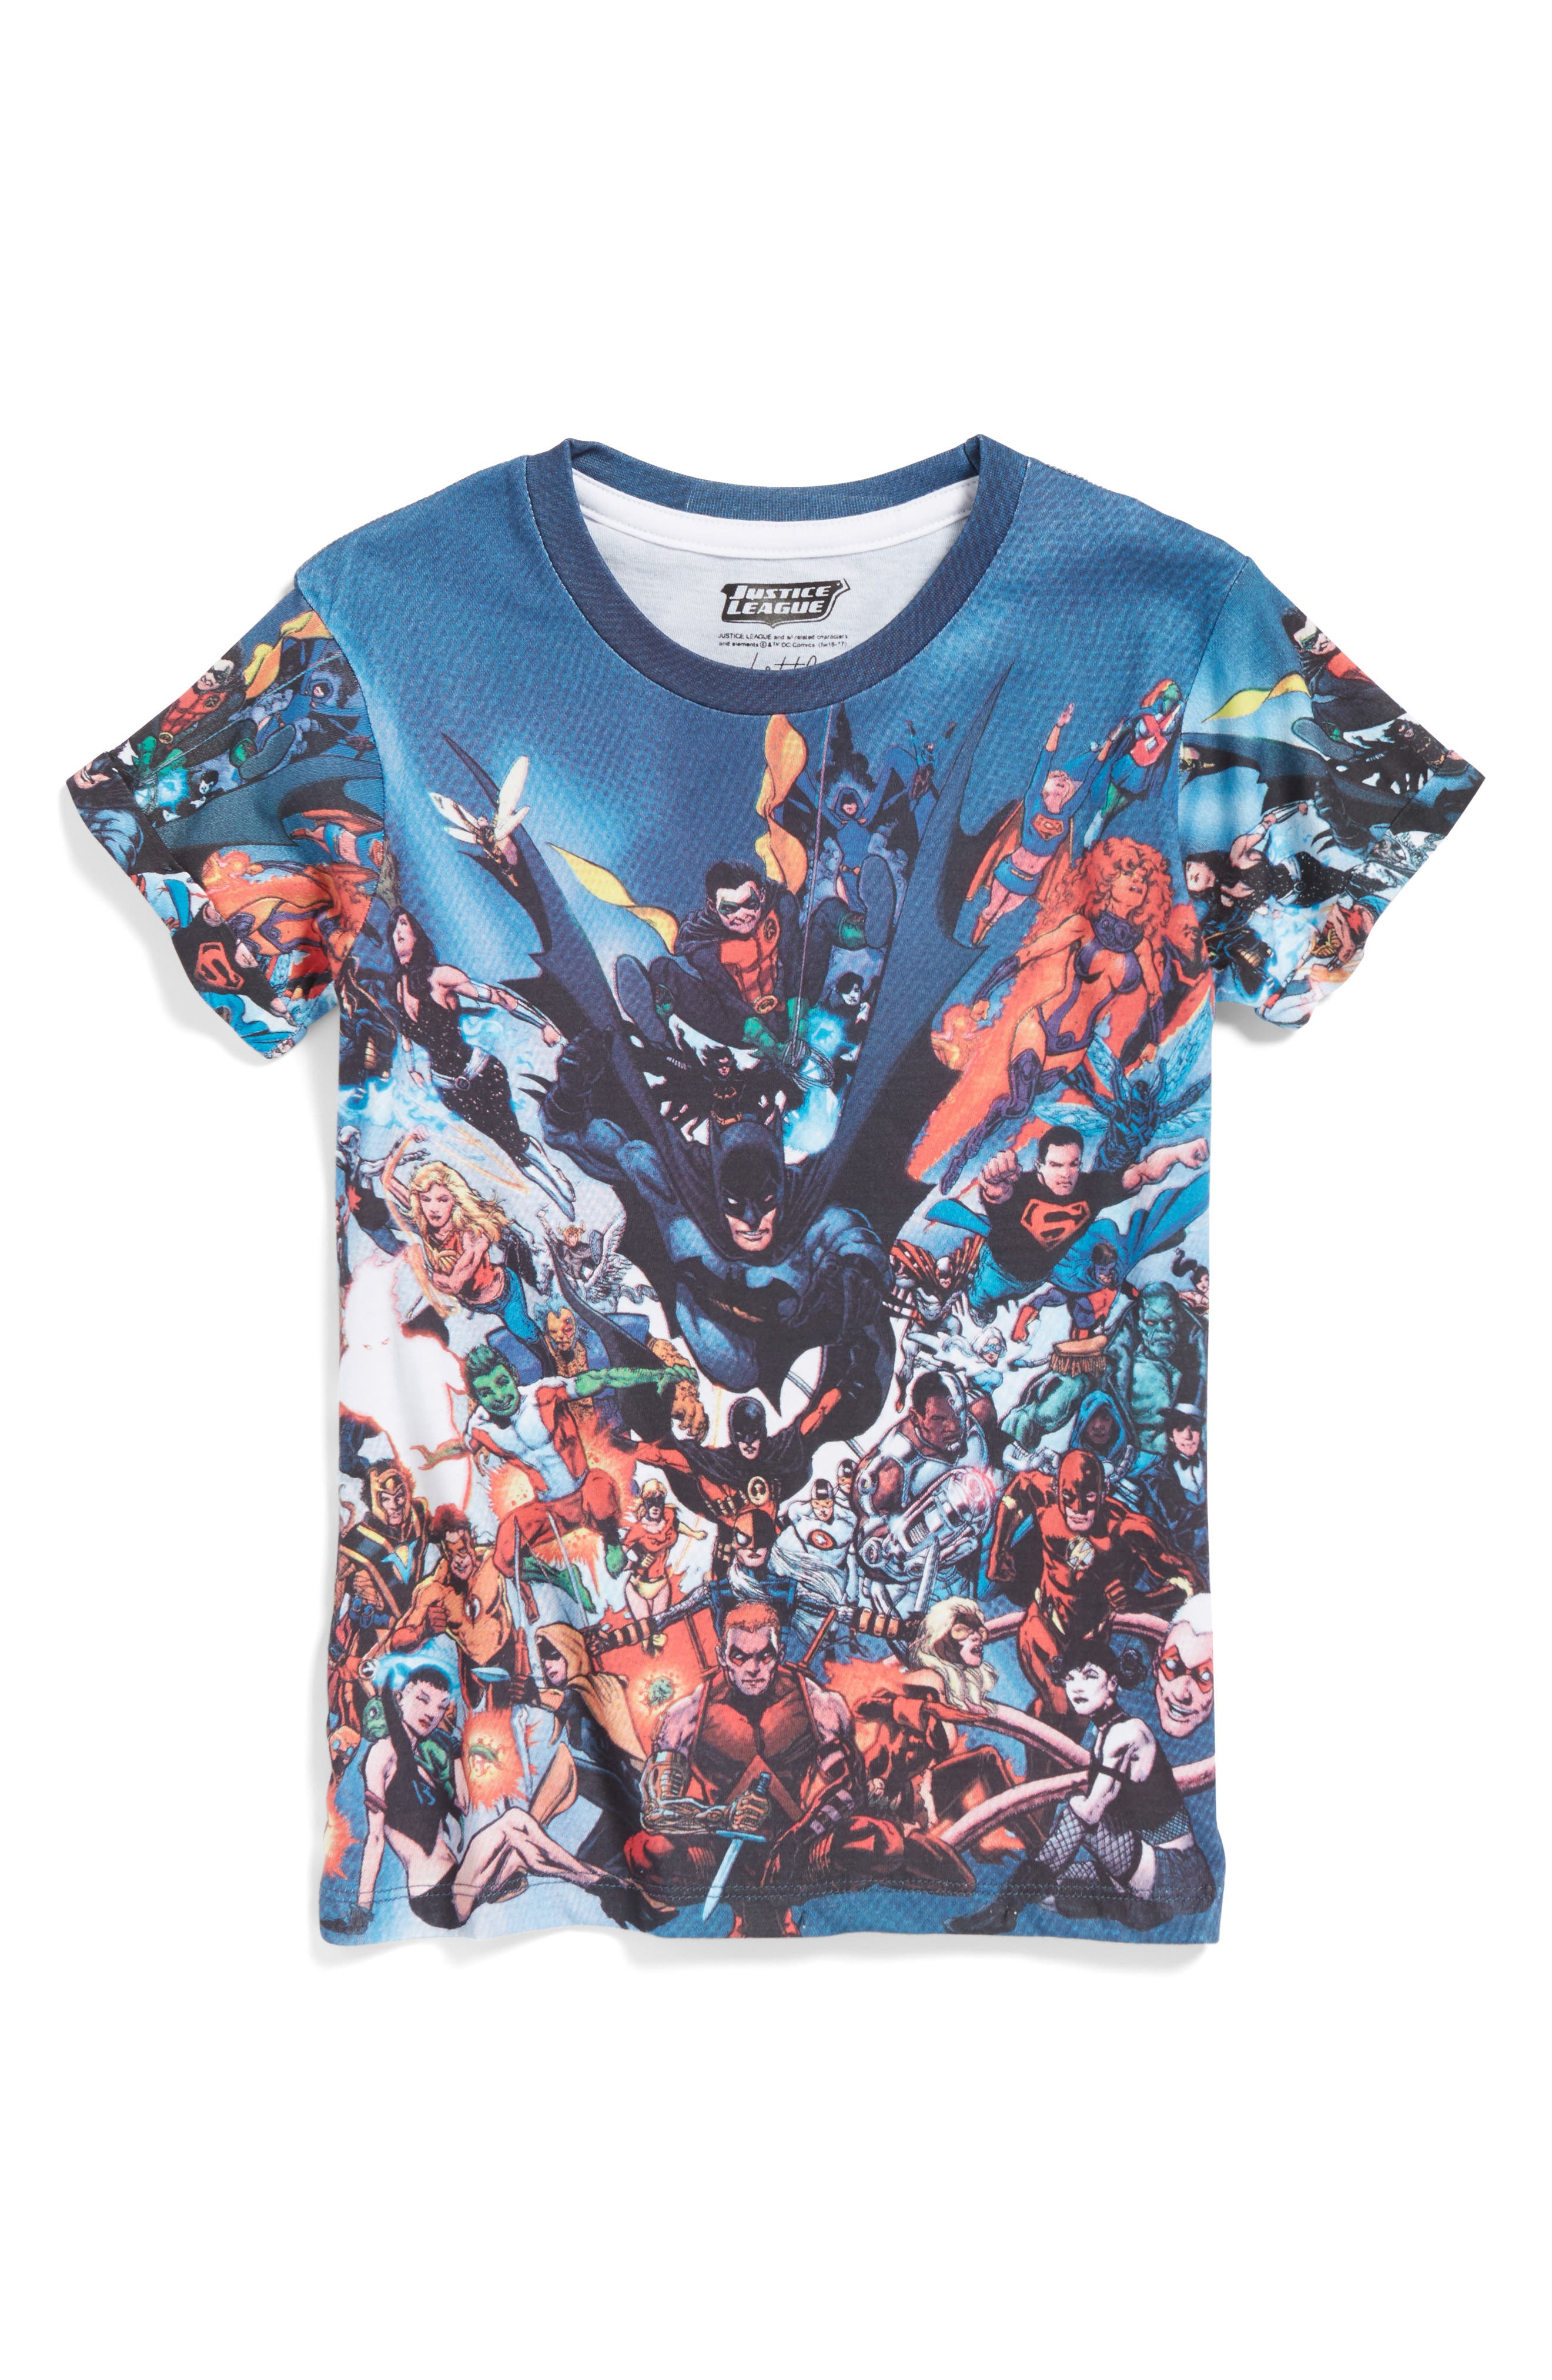 Justice League Superhero T-Shirt,                             Main thumbnail 1, color,                             Multi